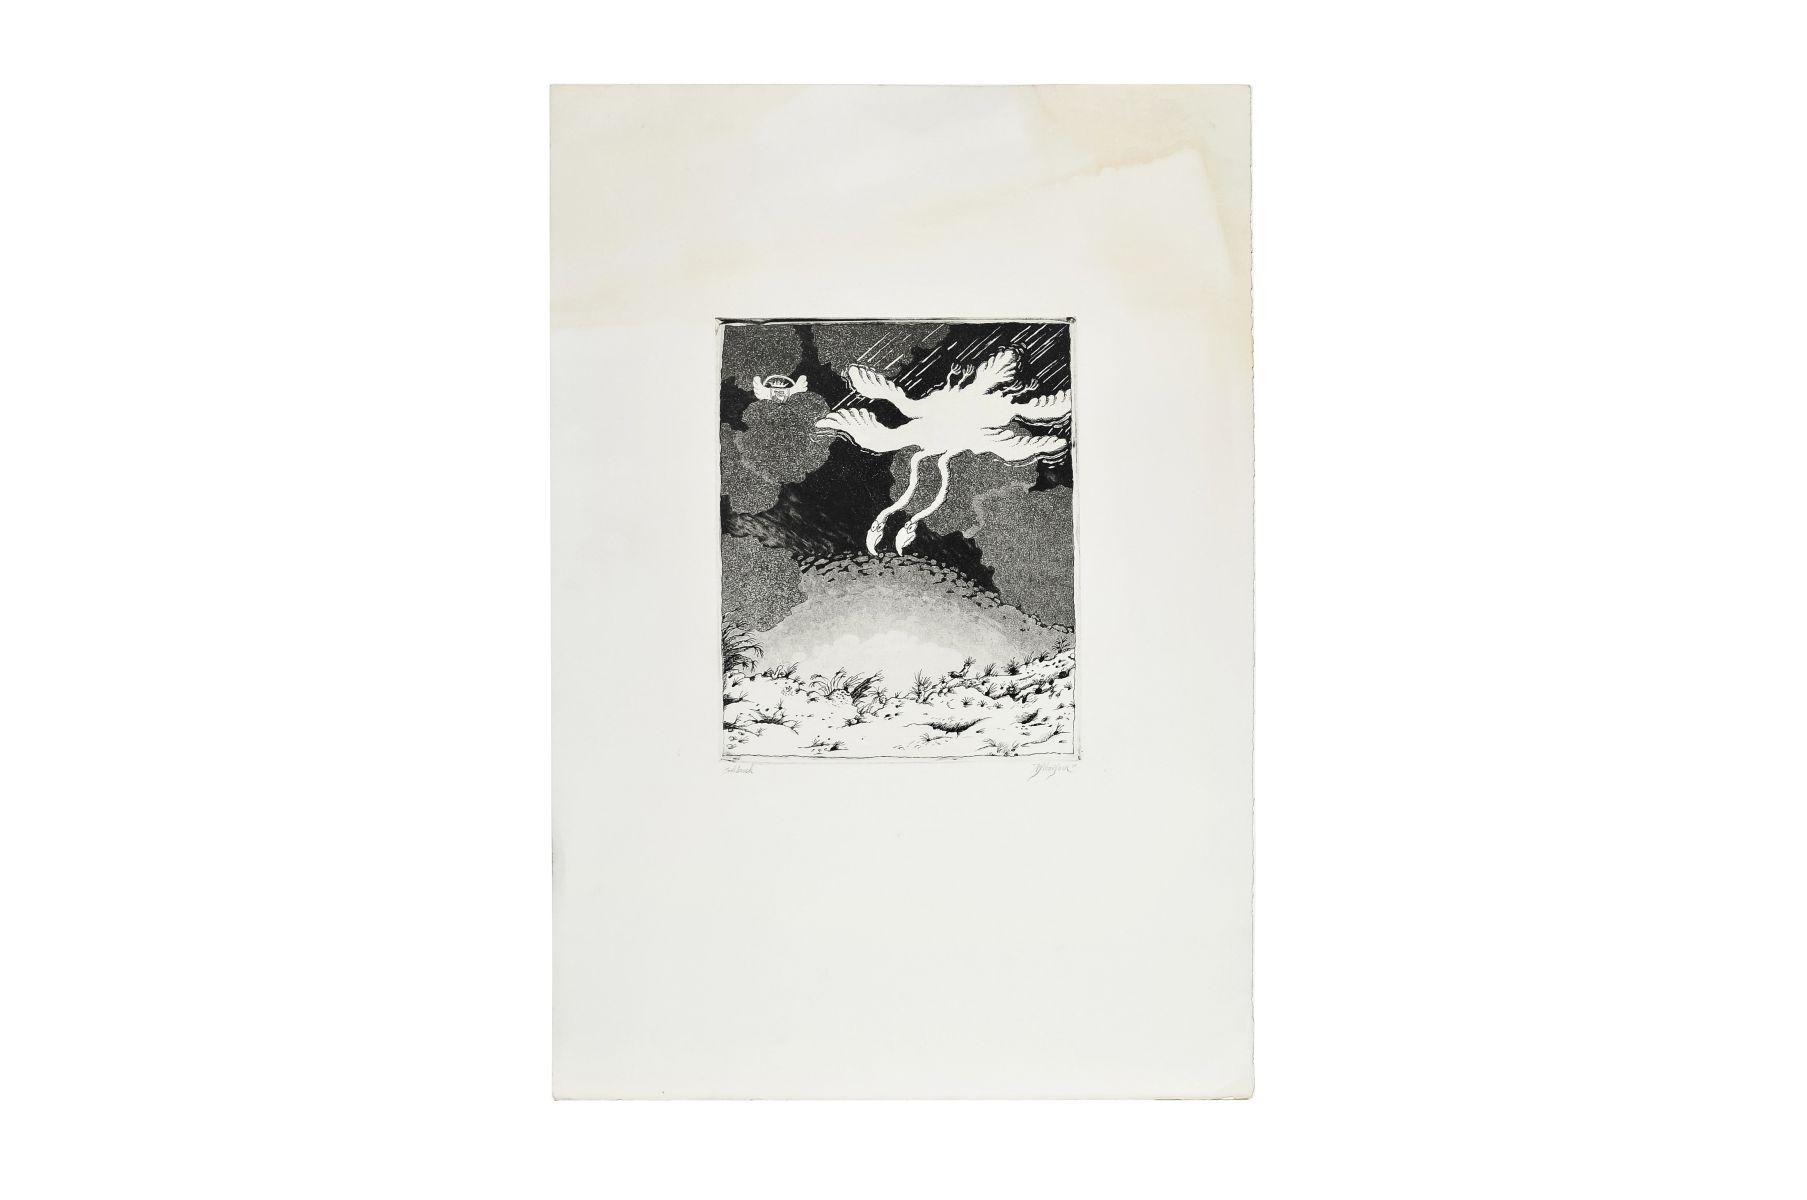 "#96 Walter Schmöger           ""Test Print"" | Walter Schmöger (* 11. Juni 1943 in Wien)  ""Probedruck"" Image"